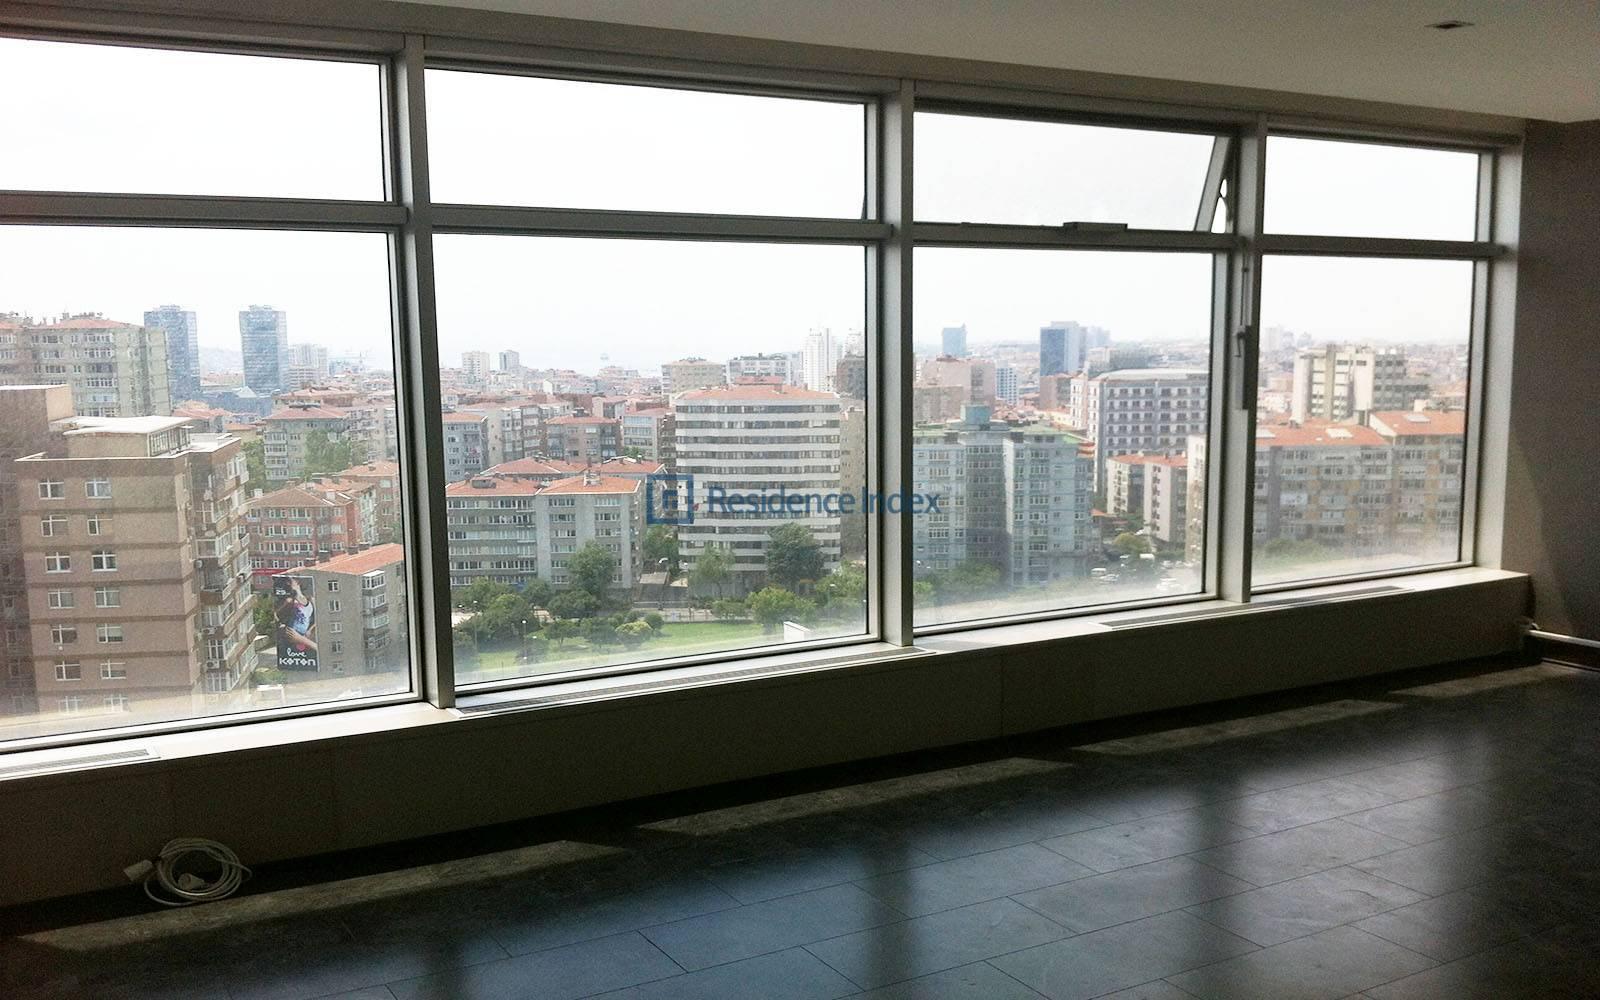 Astoria Kempinski - 1 + 1 apartment for rent